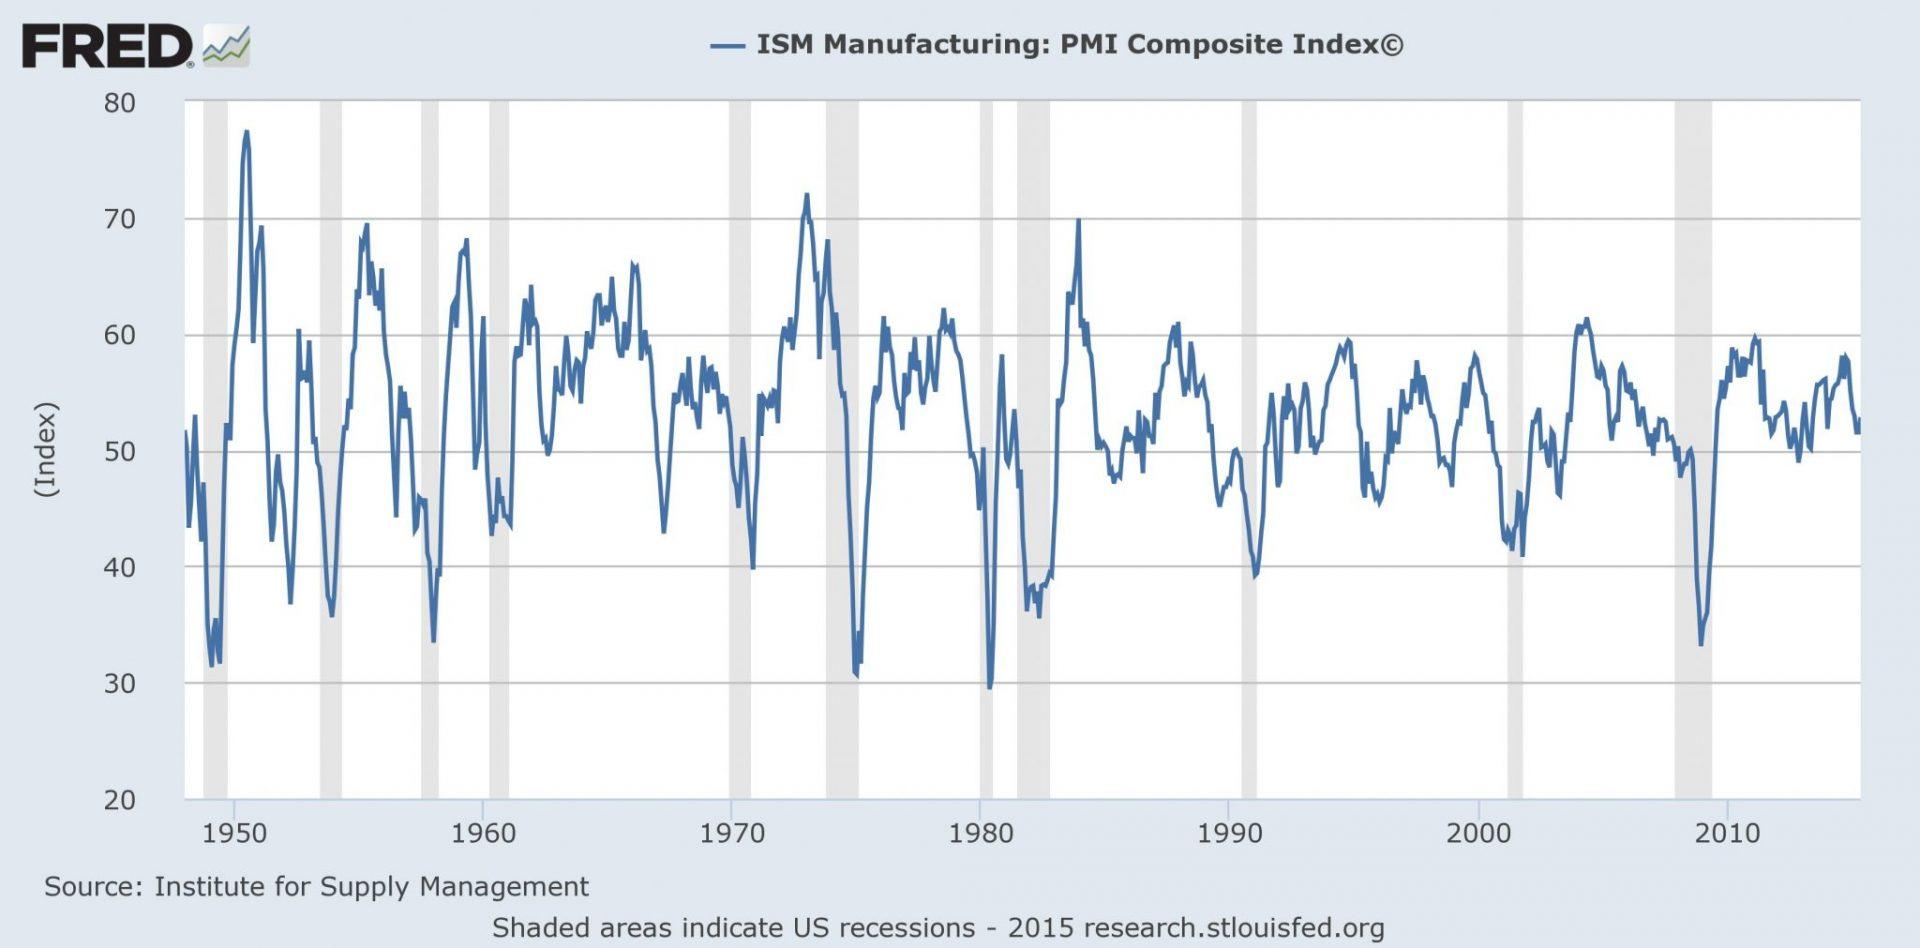 ISM Manufacturing PMI Index